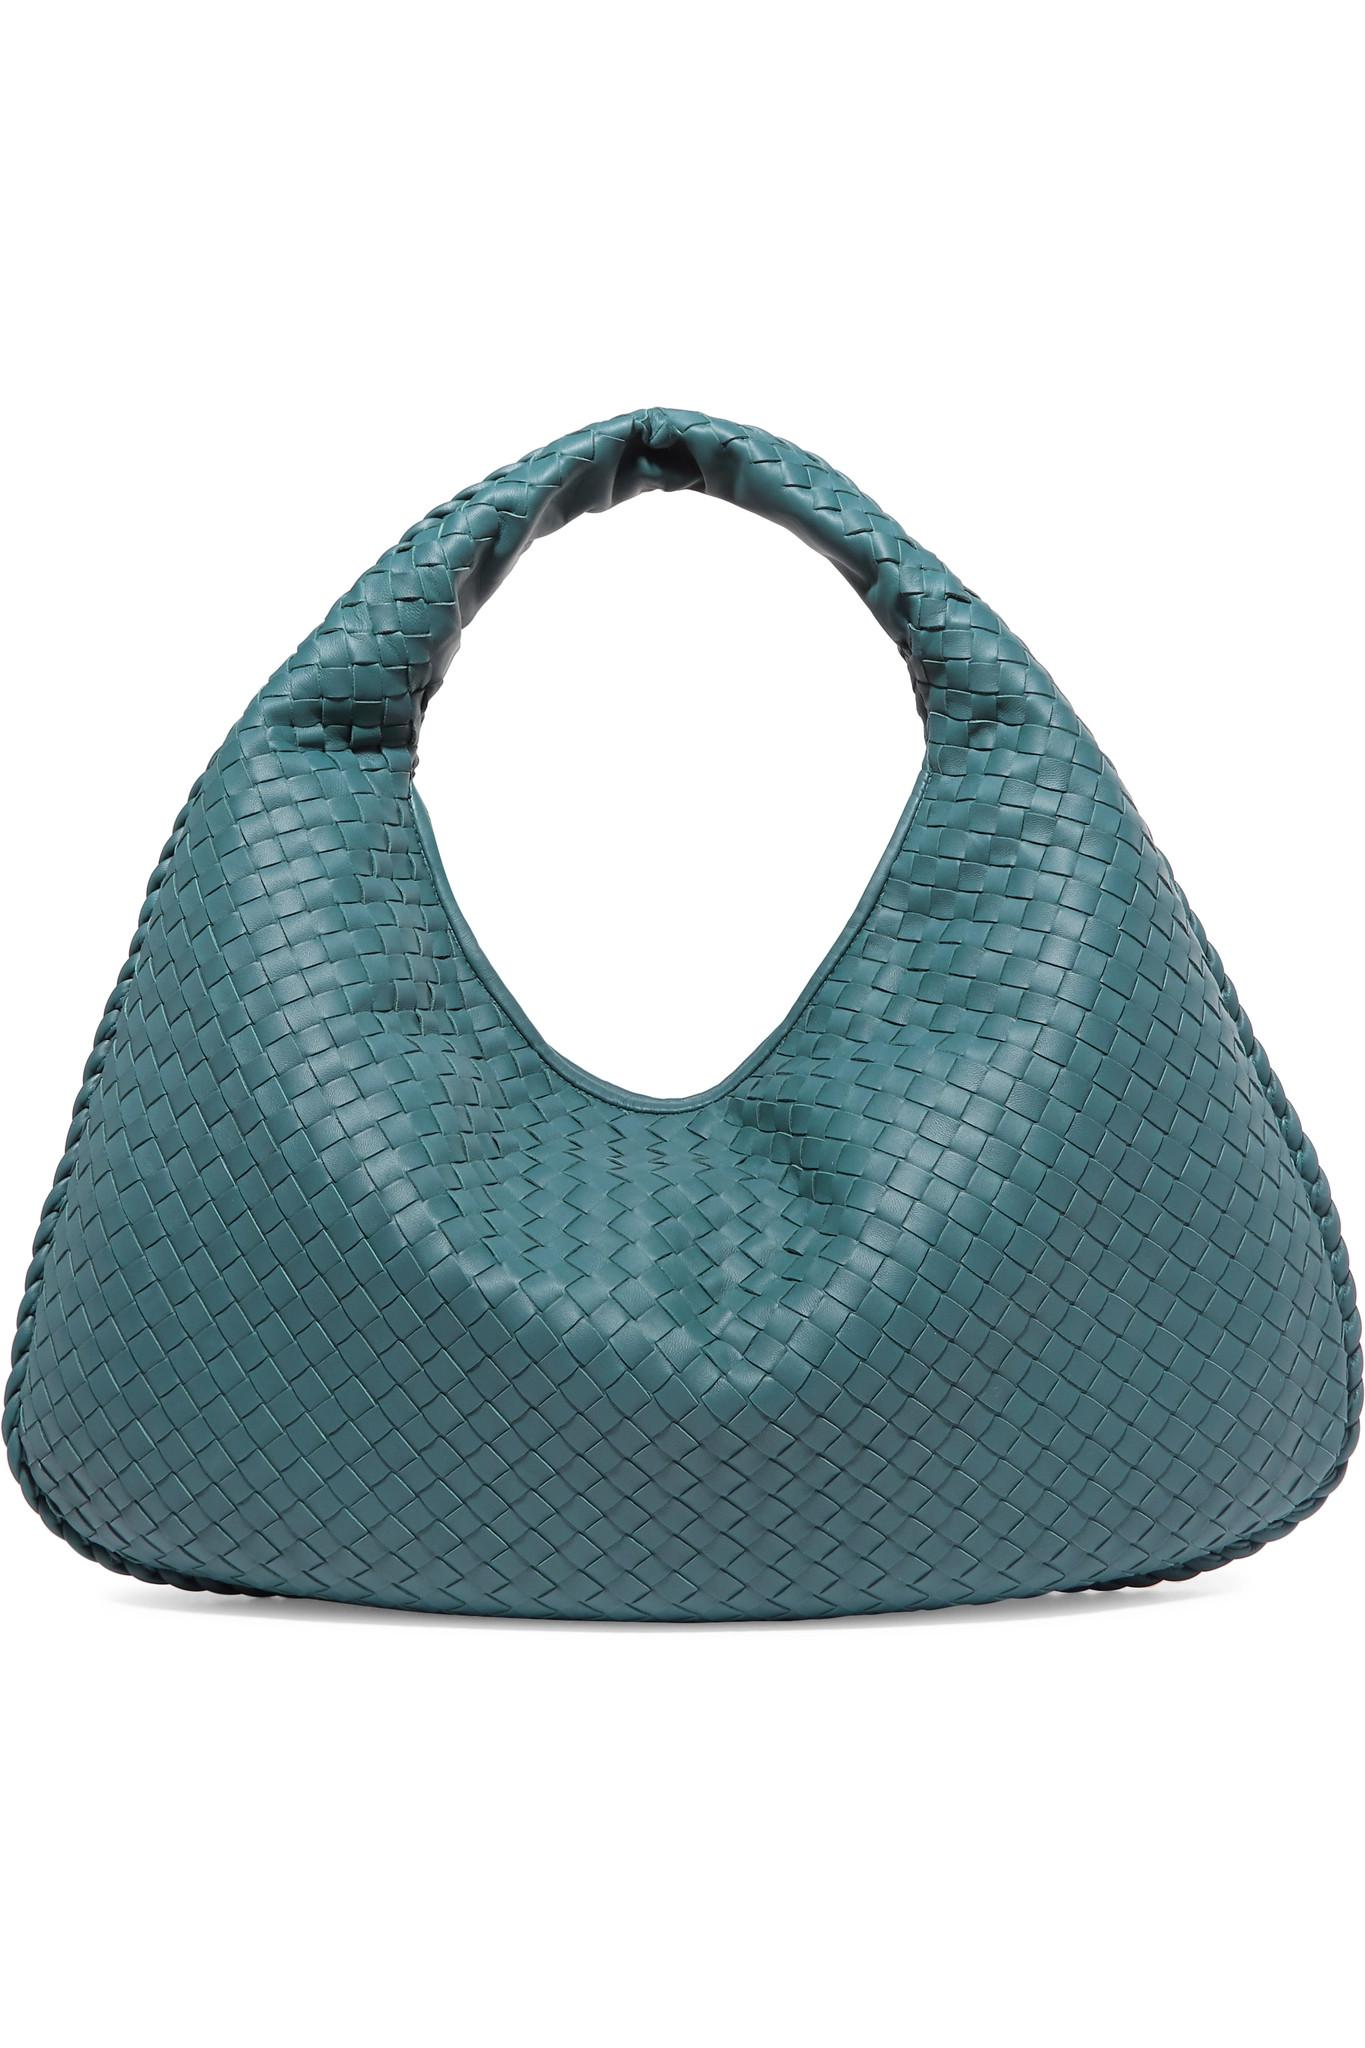 Bottega Veneta. Women s Blue Veneta Large Intrecciato Leather Shoulder Bag dd8ed2cd65